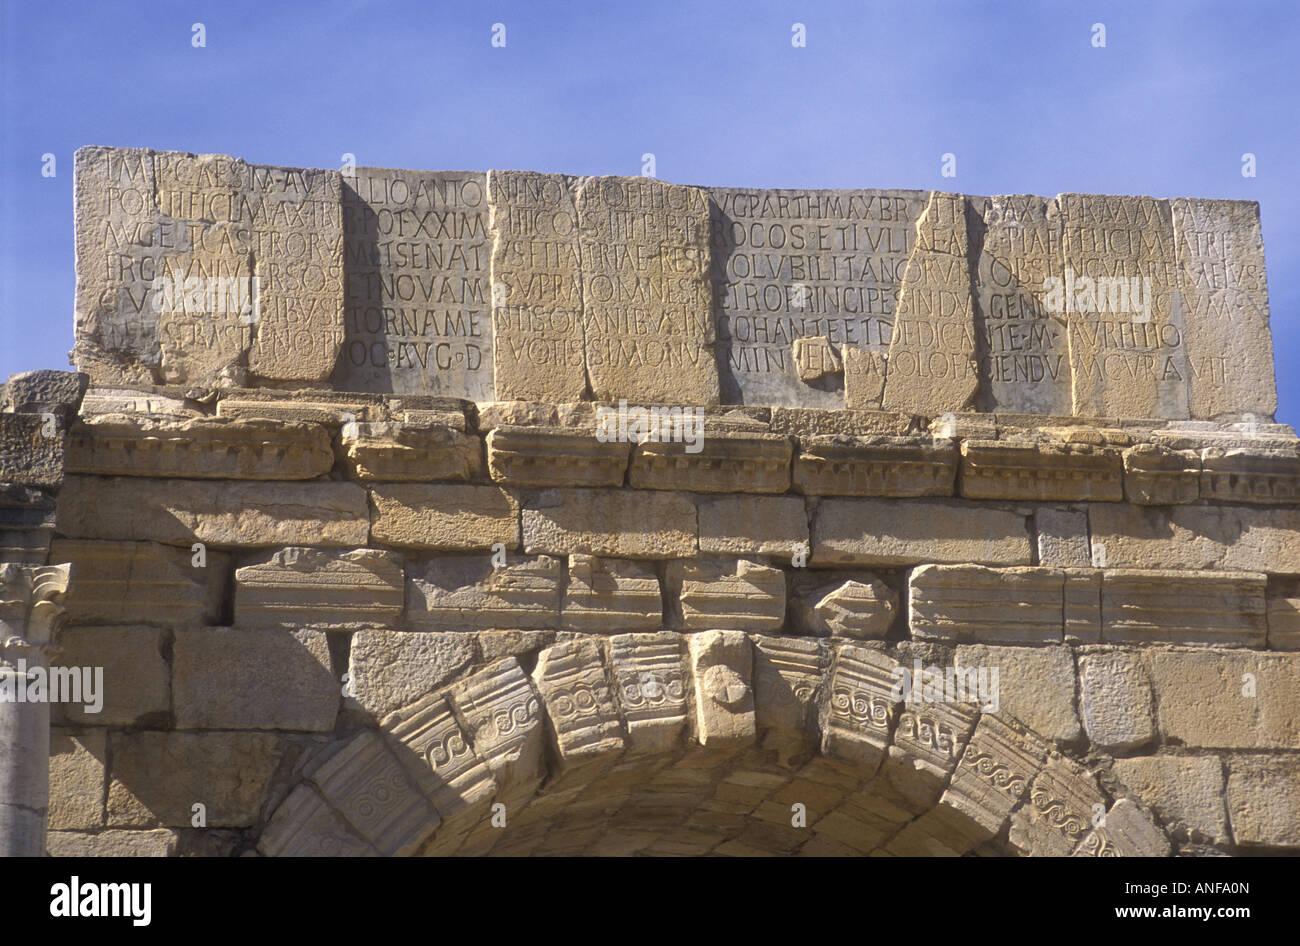 Latin Inscription obove the Triumphal Arch in the Roman ruins at Volubilis Morocco North Africa Stock Photo